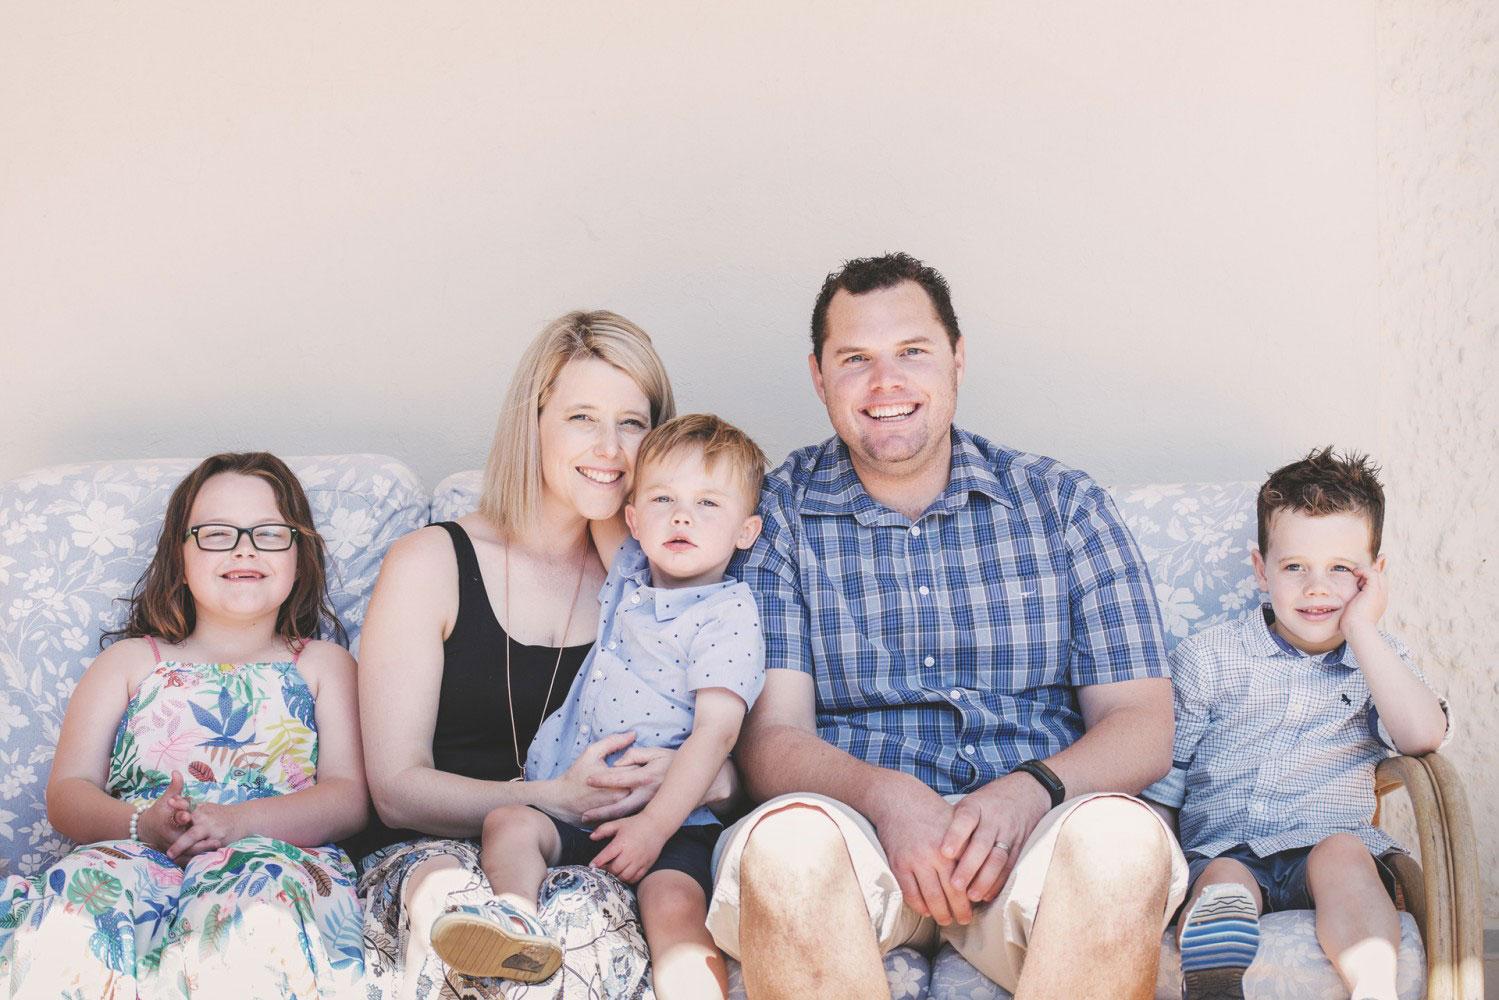 Jessica-Lemon-Photography-Adelaide-Family-Group-Photographer.jpg